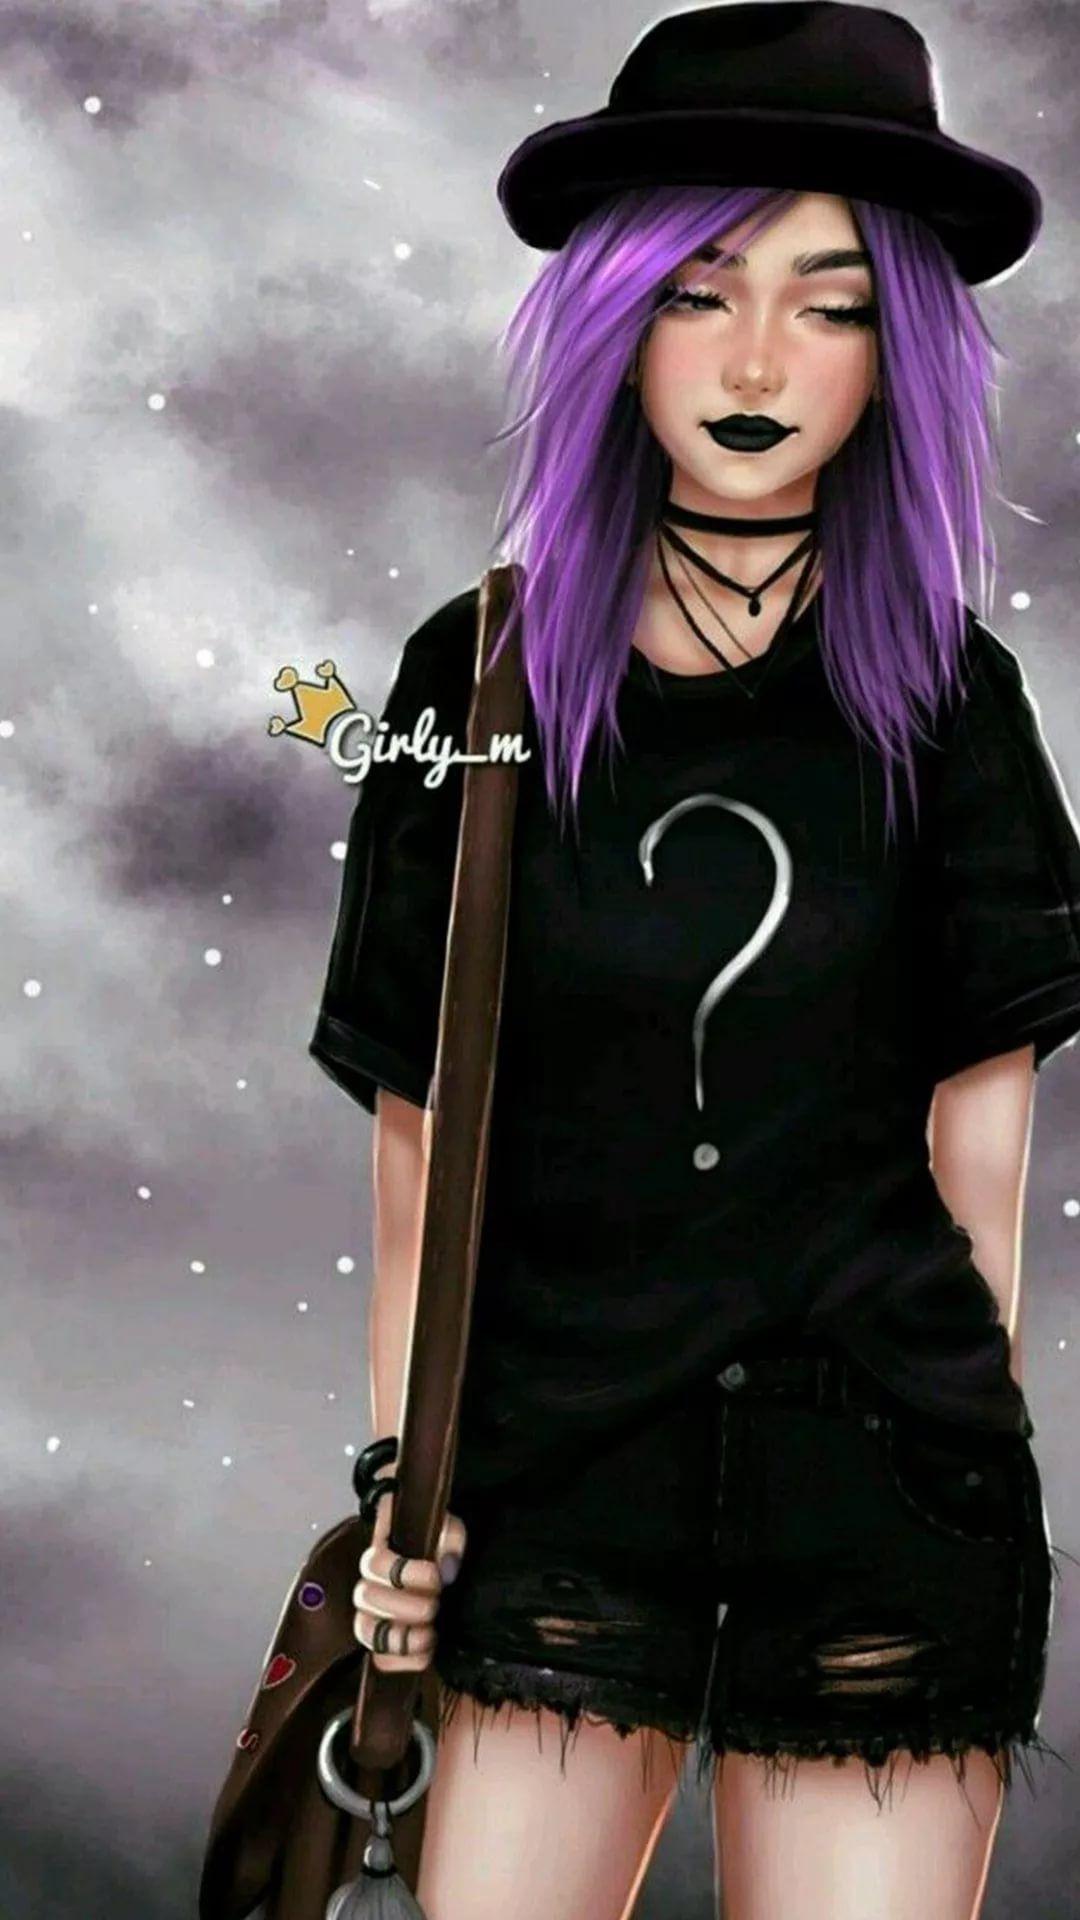 Emo Picture Galaxy s9 wallpaper